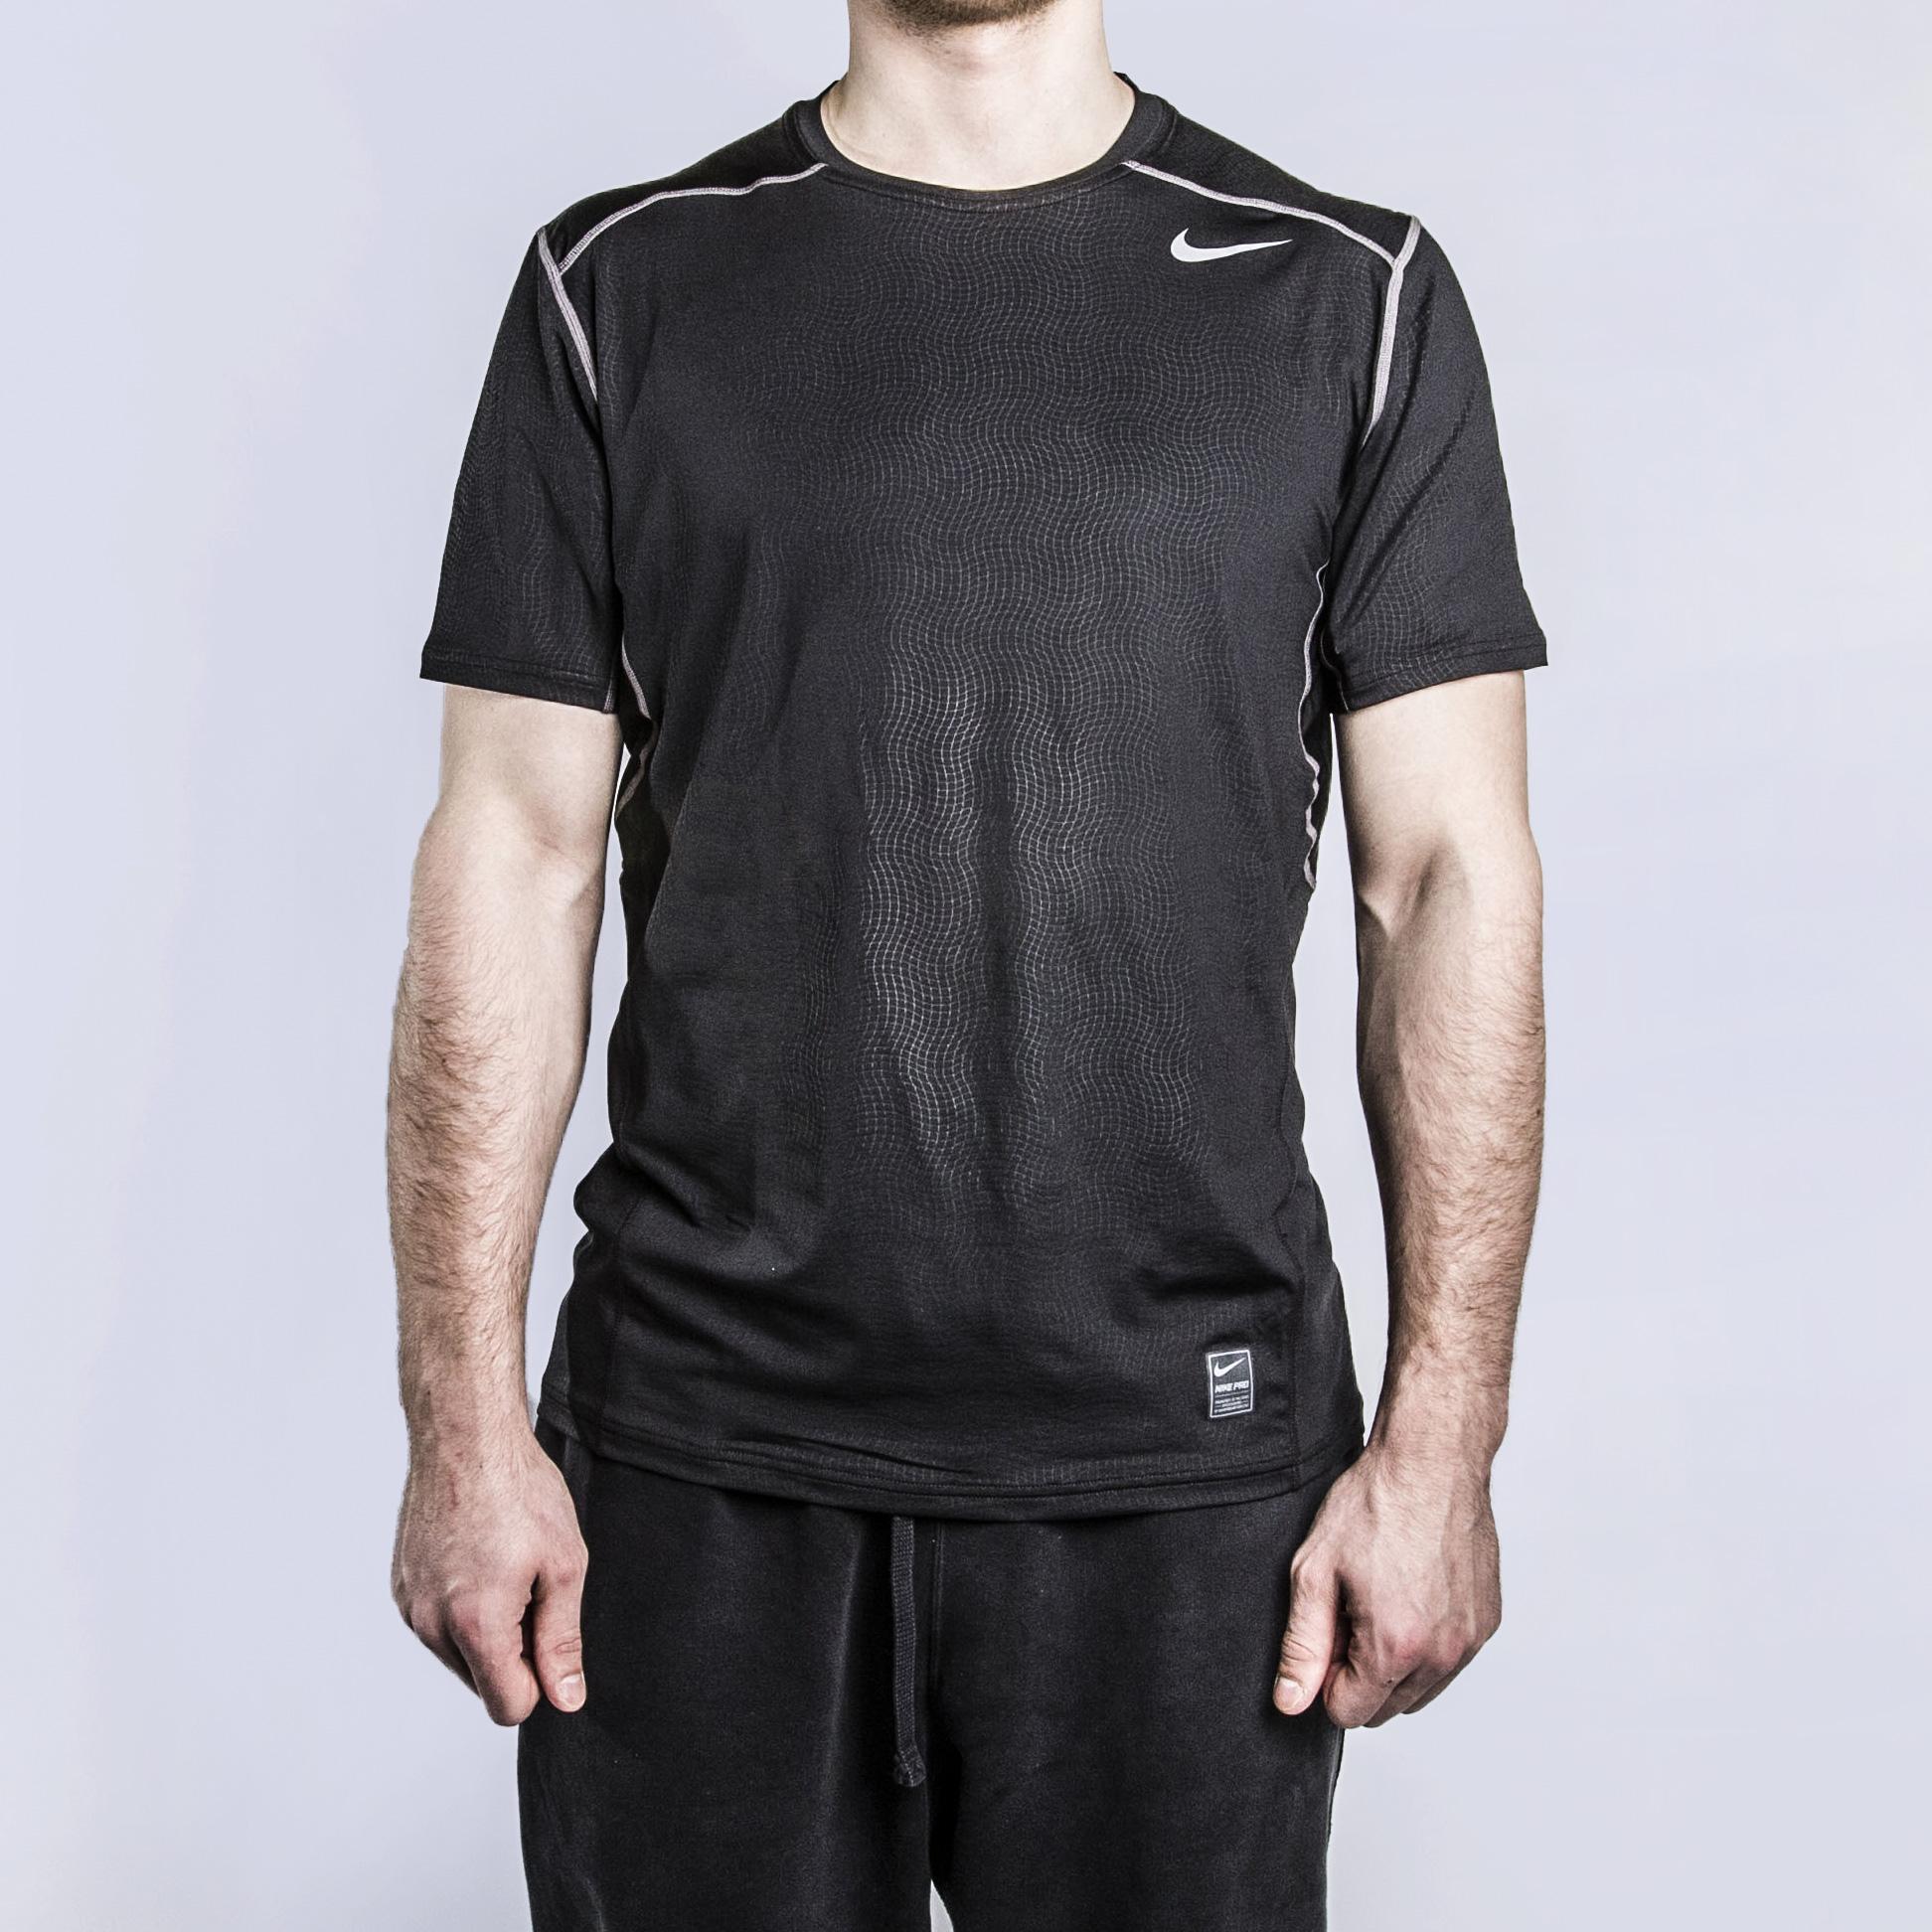 Футболка для тренинга Nike Hypercool FTTD SS TopФутболки<br>92% полиэстер, 8% эластан<br><br>Цвет: Черный<br>Размеры US: M;XL<br>Пол: Мужской